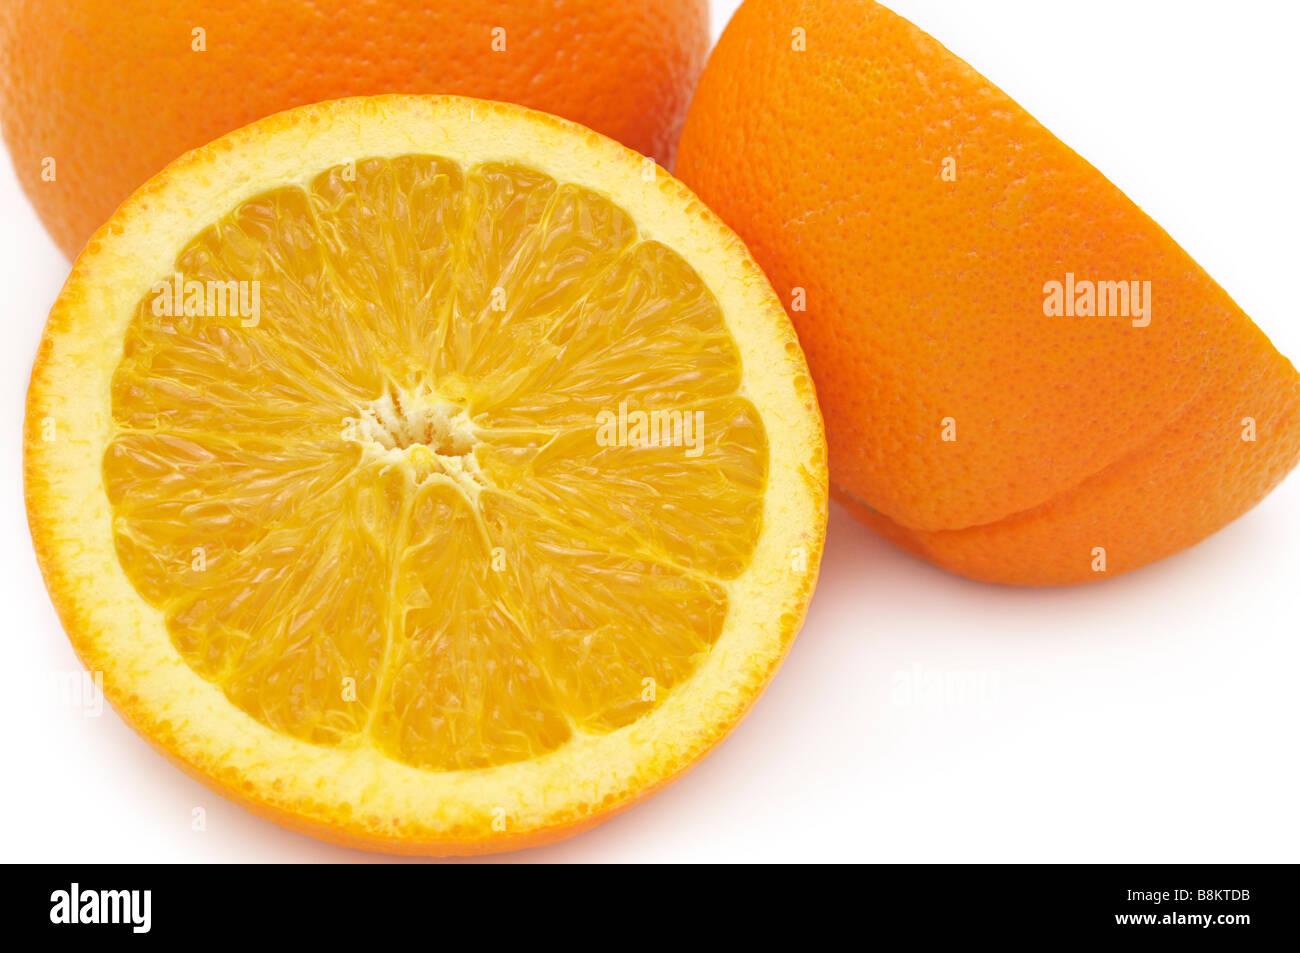 Oranges closeup, Whole and Half - Stock Image